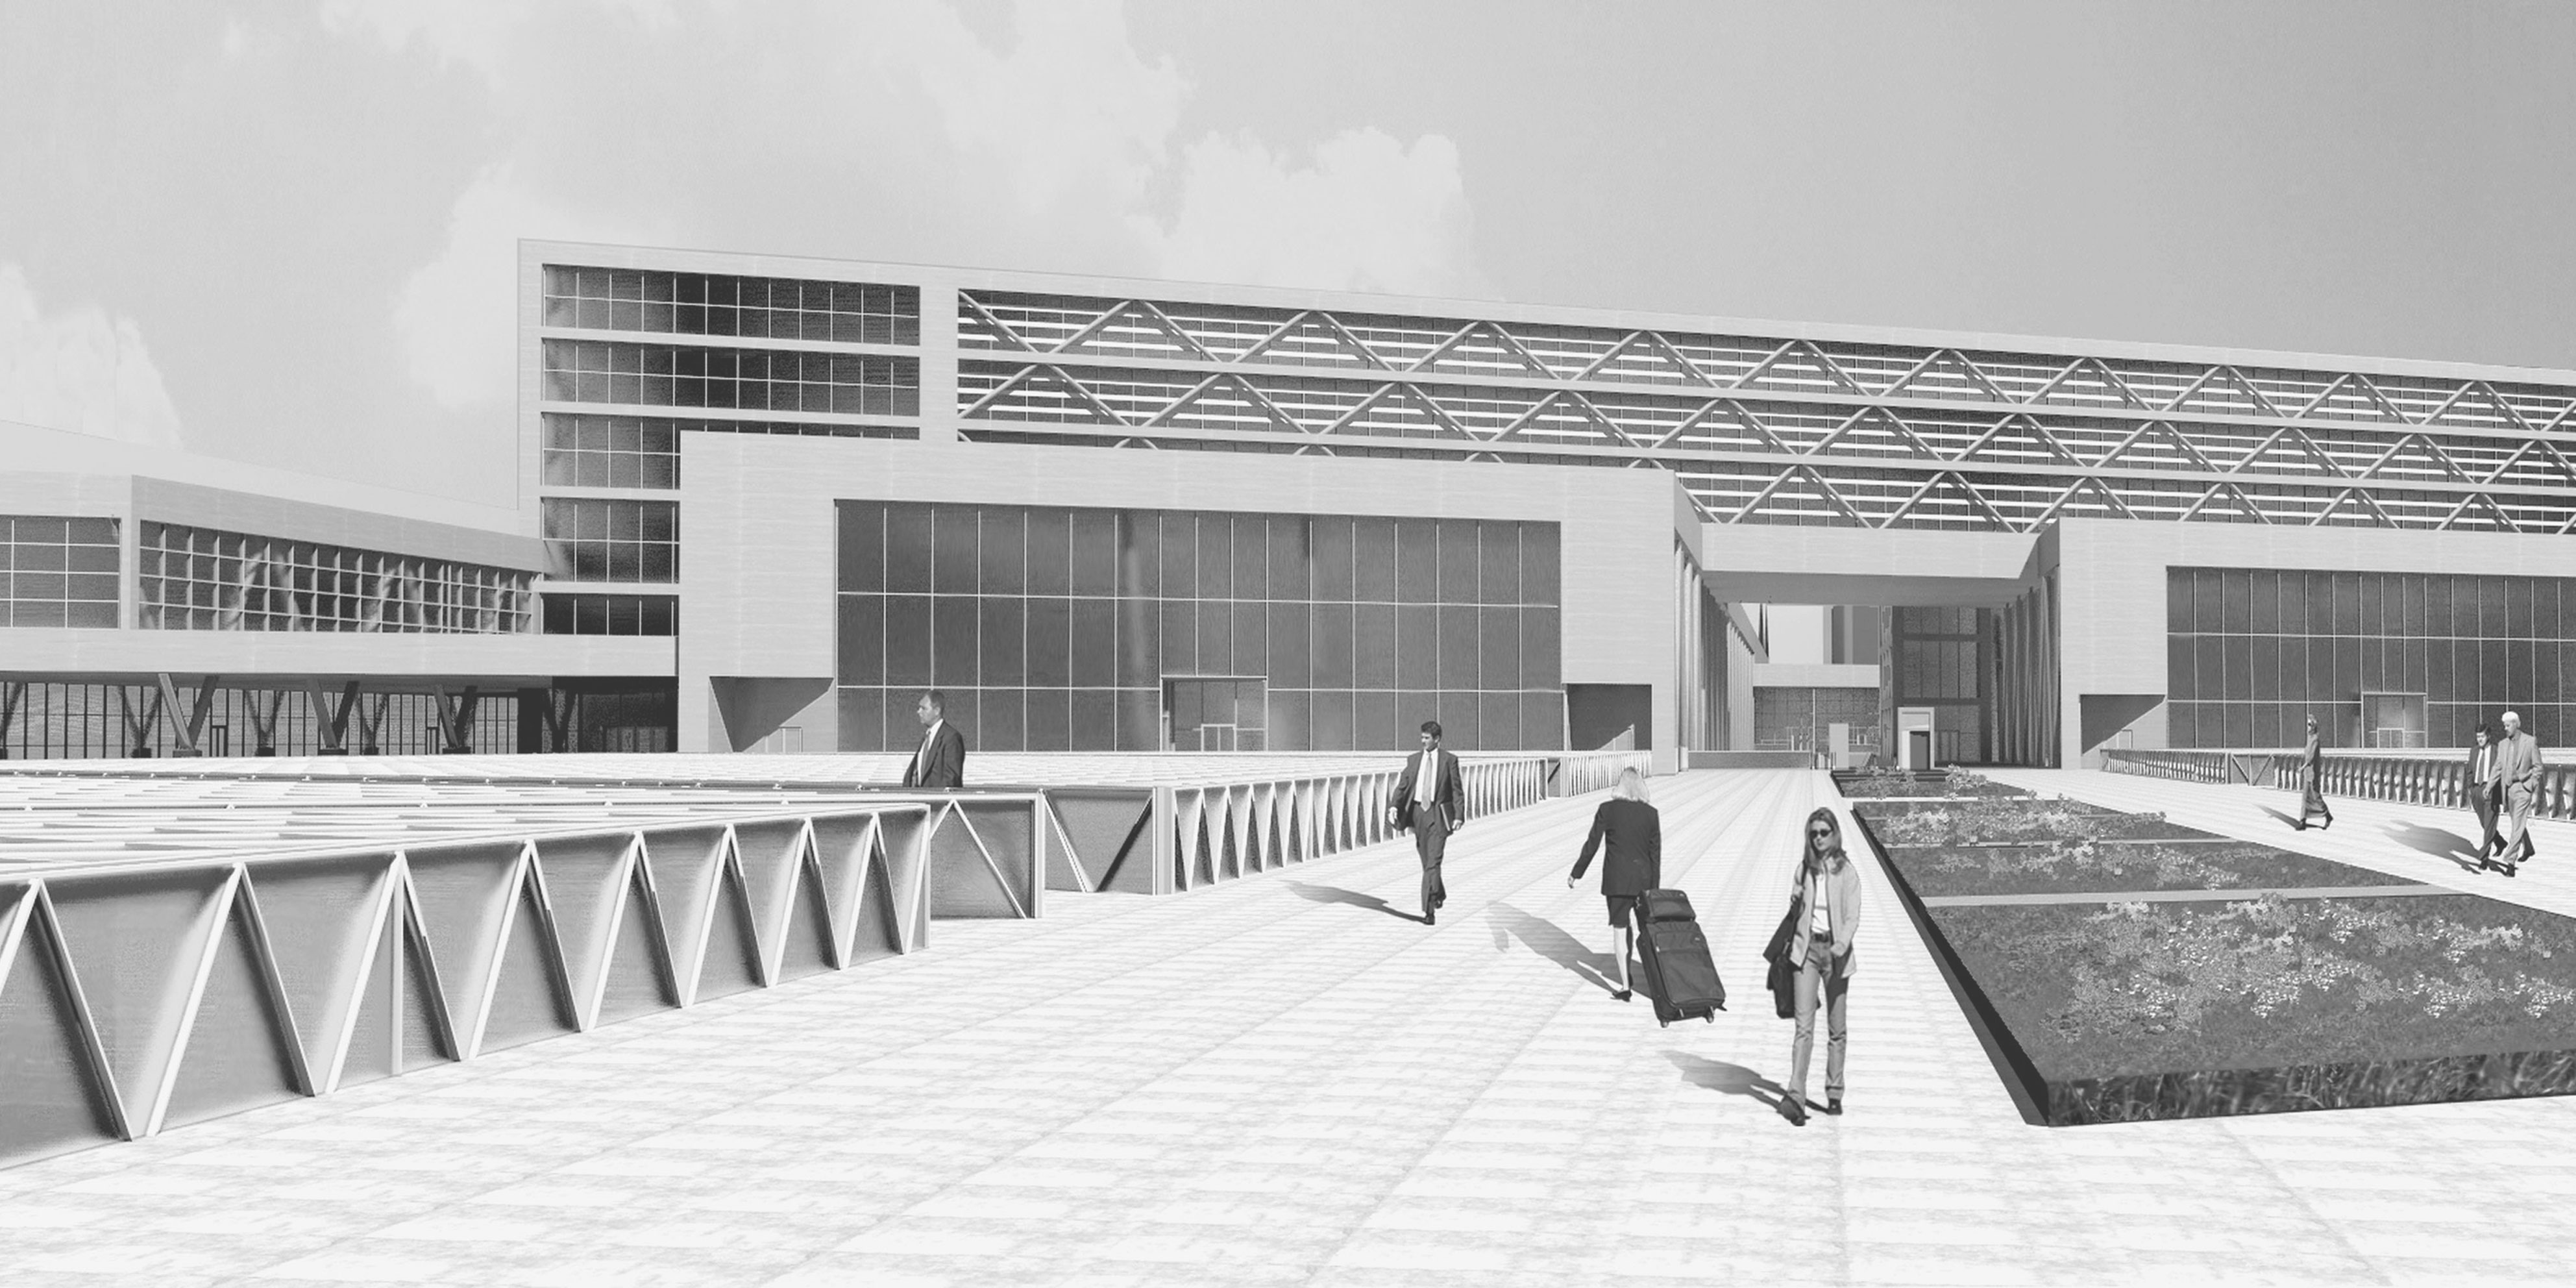 Arquitectos en zaragoza - Estudio arquitectura zaragoza ...